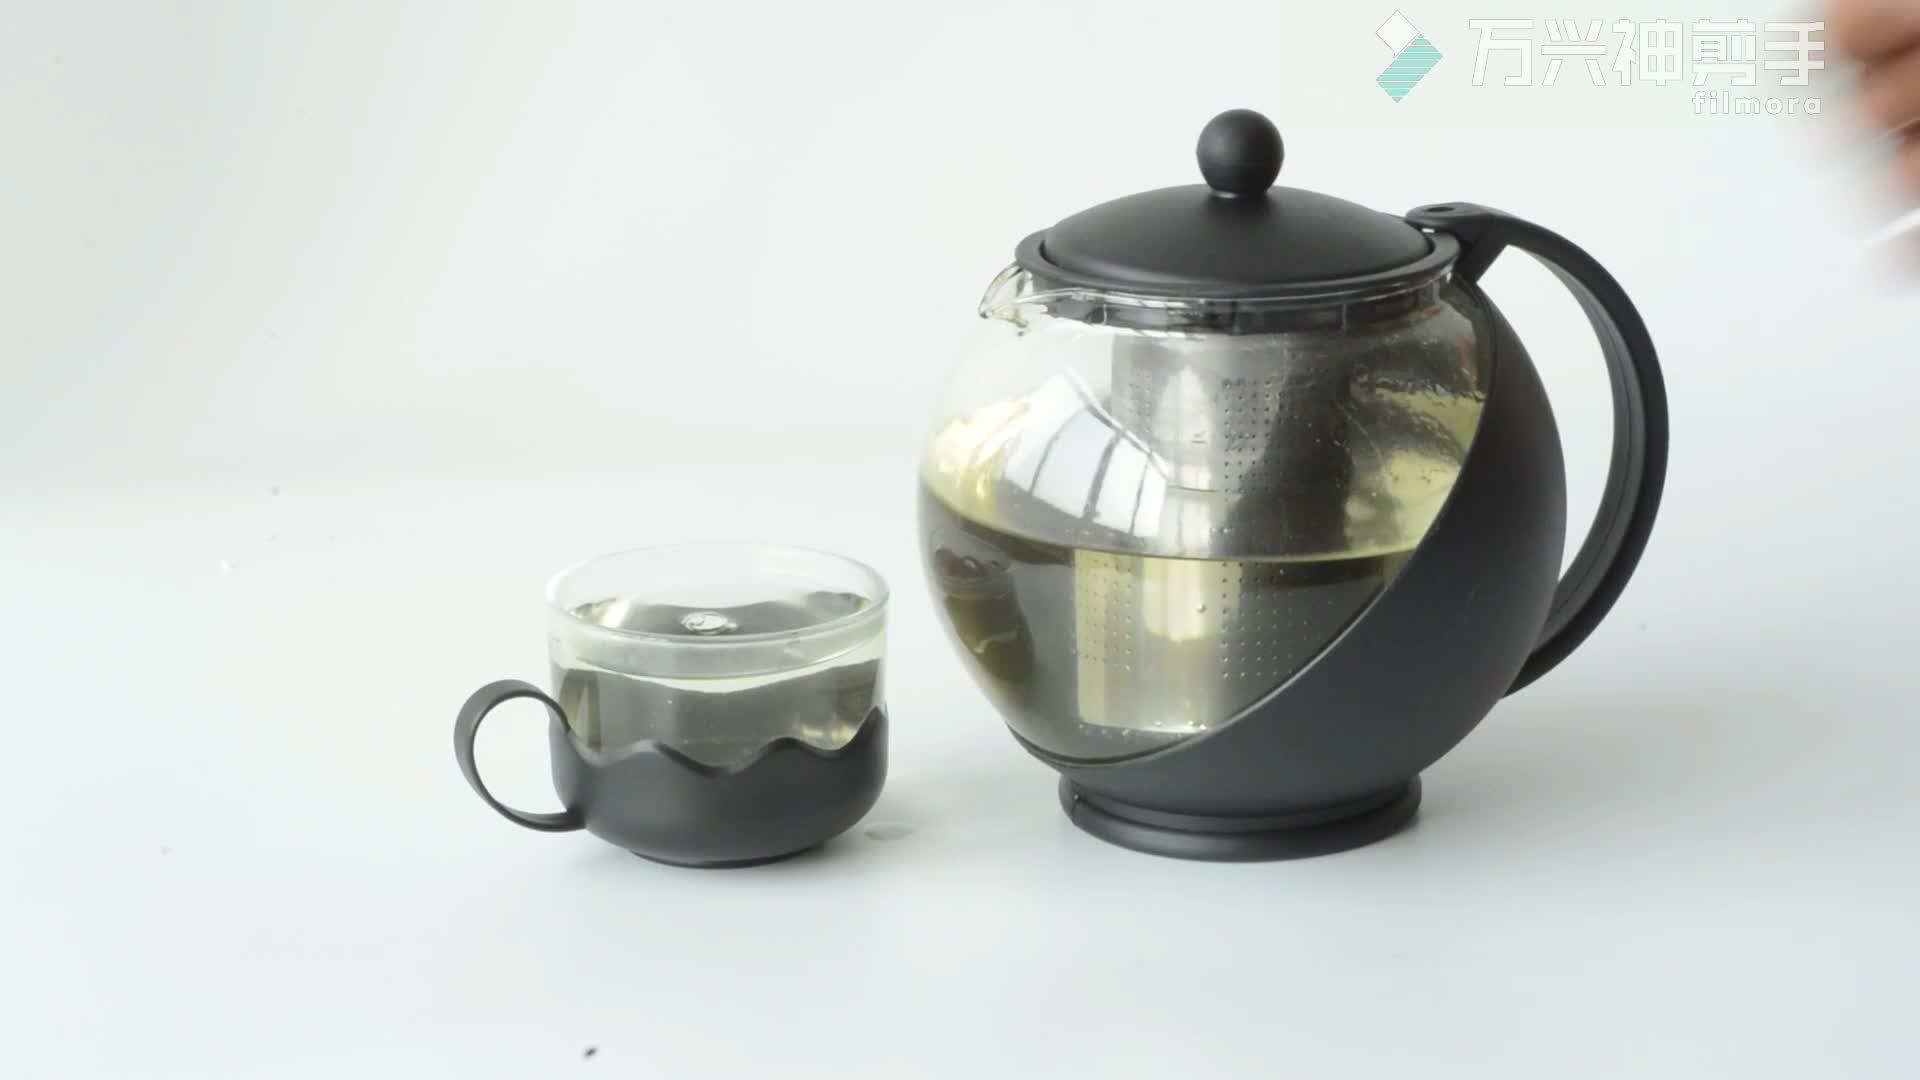 Heat Resistant Glass Percolator Coffee Pot Tea Pot - Buy ...